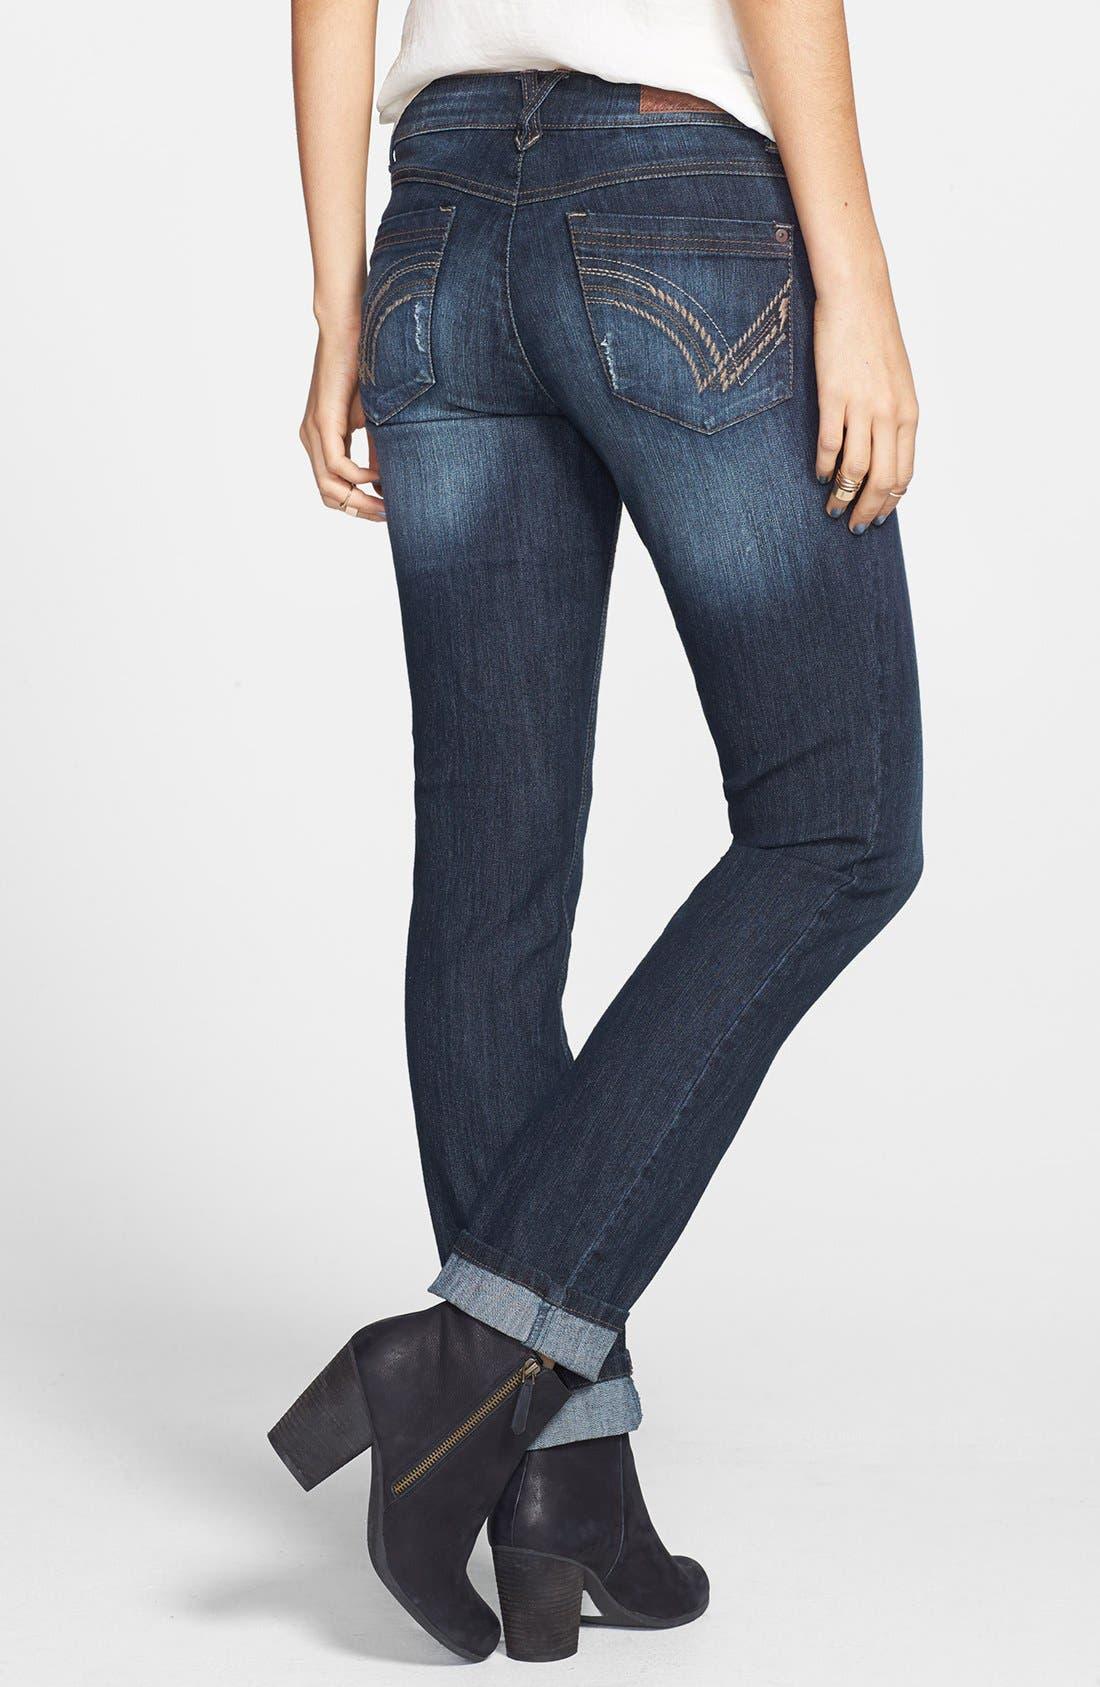 Main Image - Jolt Embroidered Pocket Skinny Jeans (Juniors)